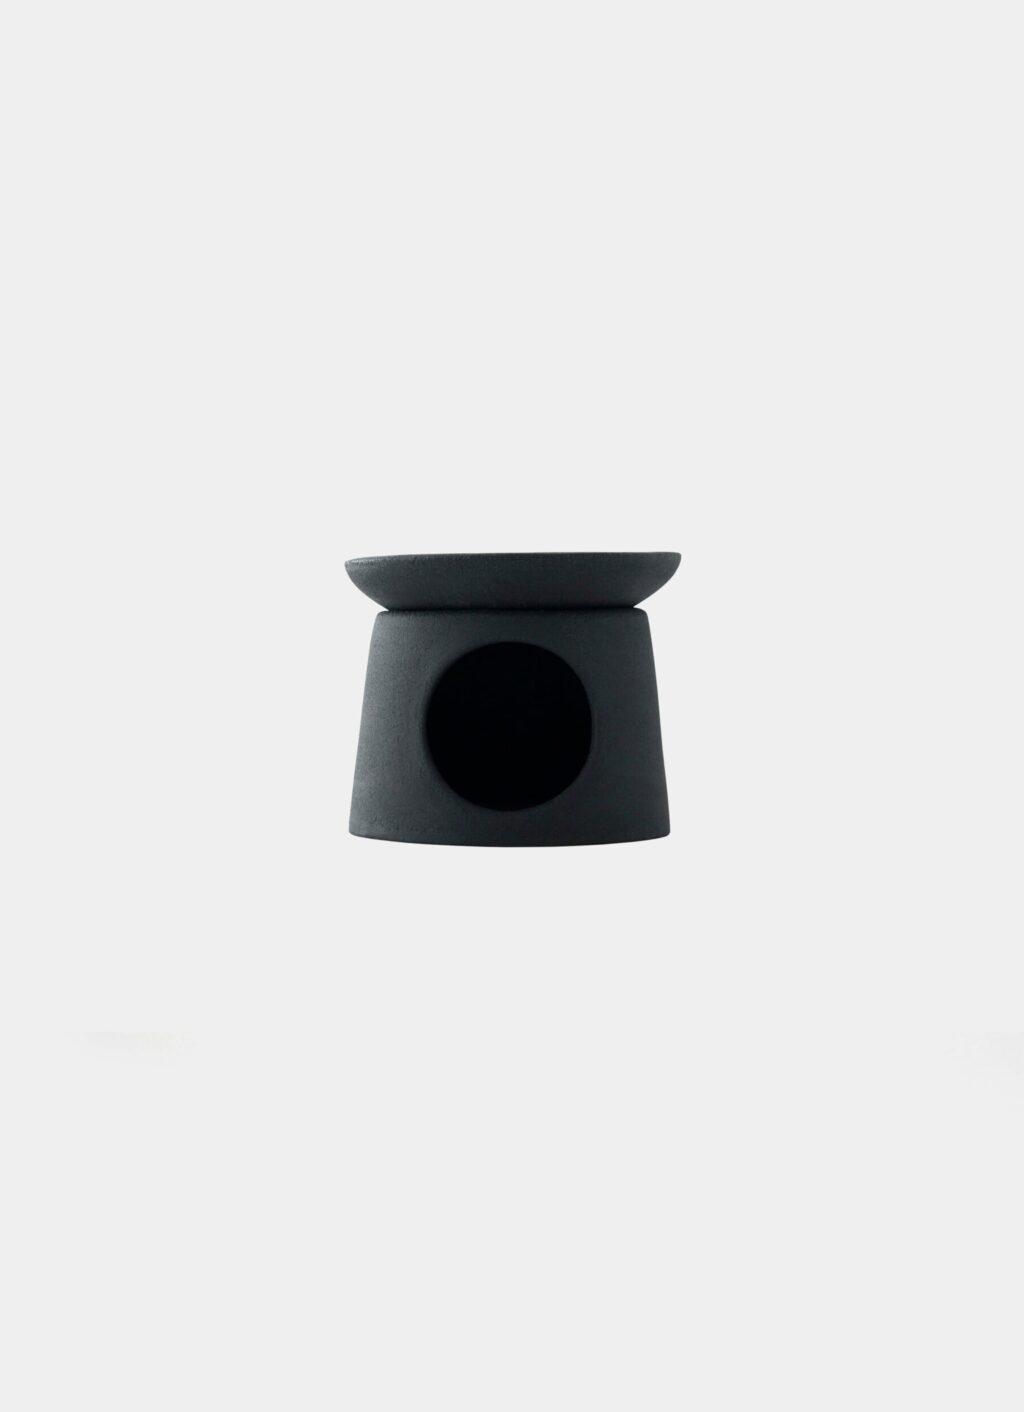 Kolektiv DVA - Oil Oil Diffuser - white - black - sand